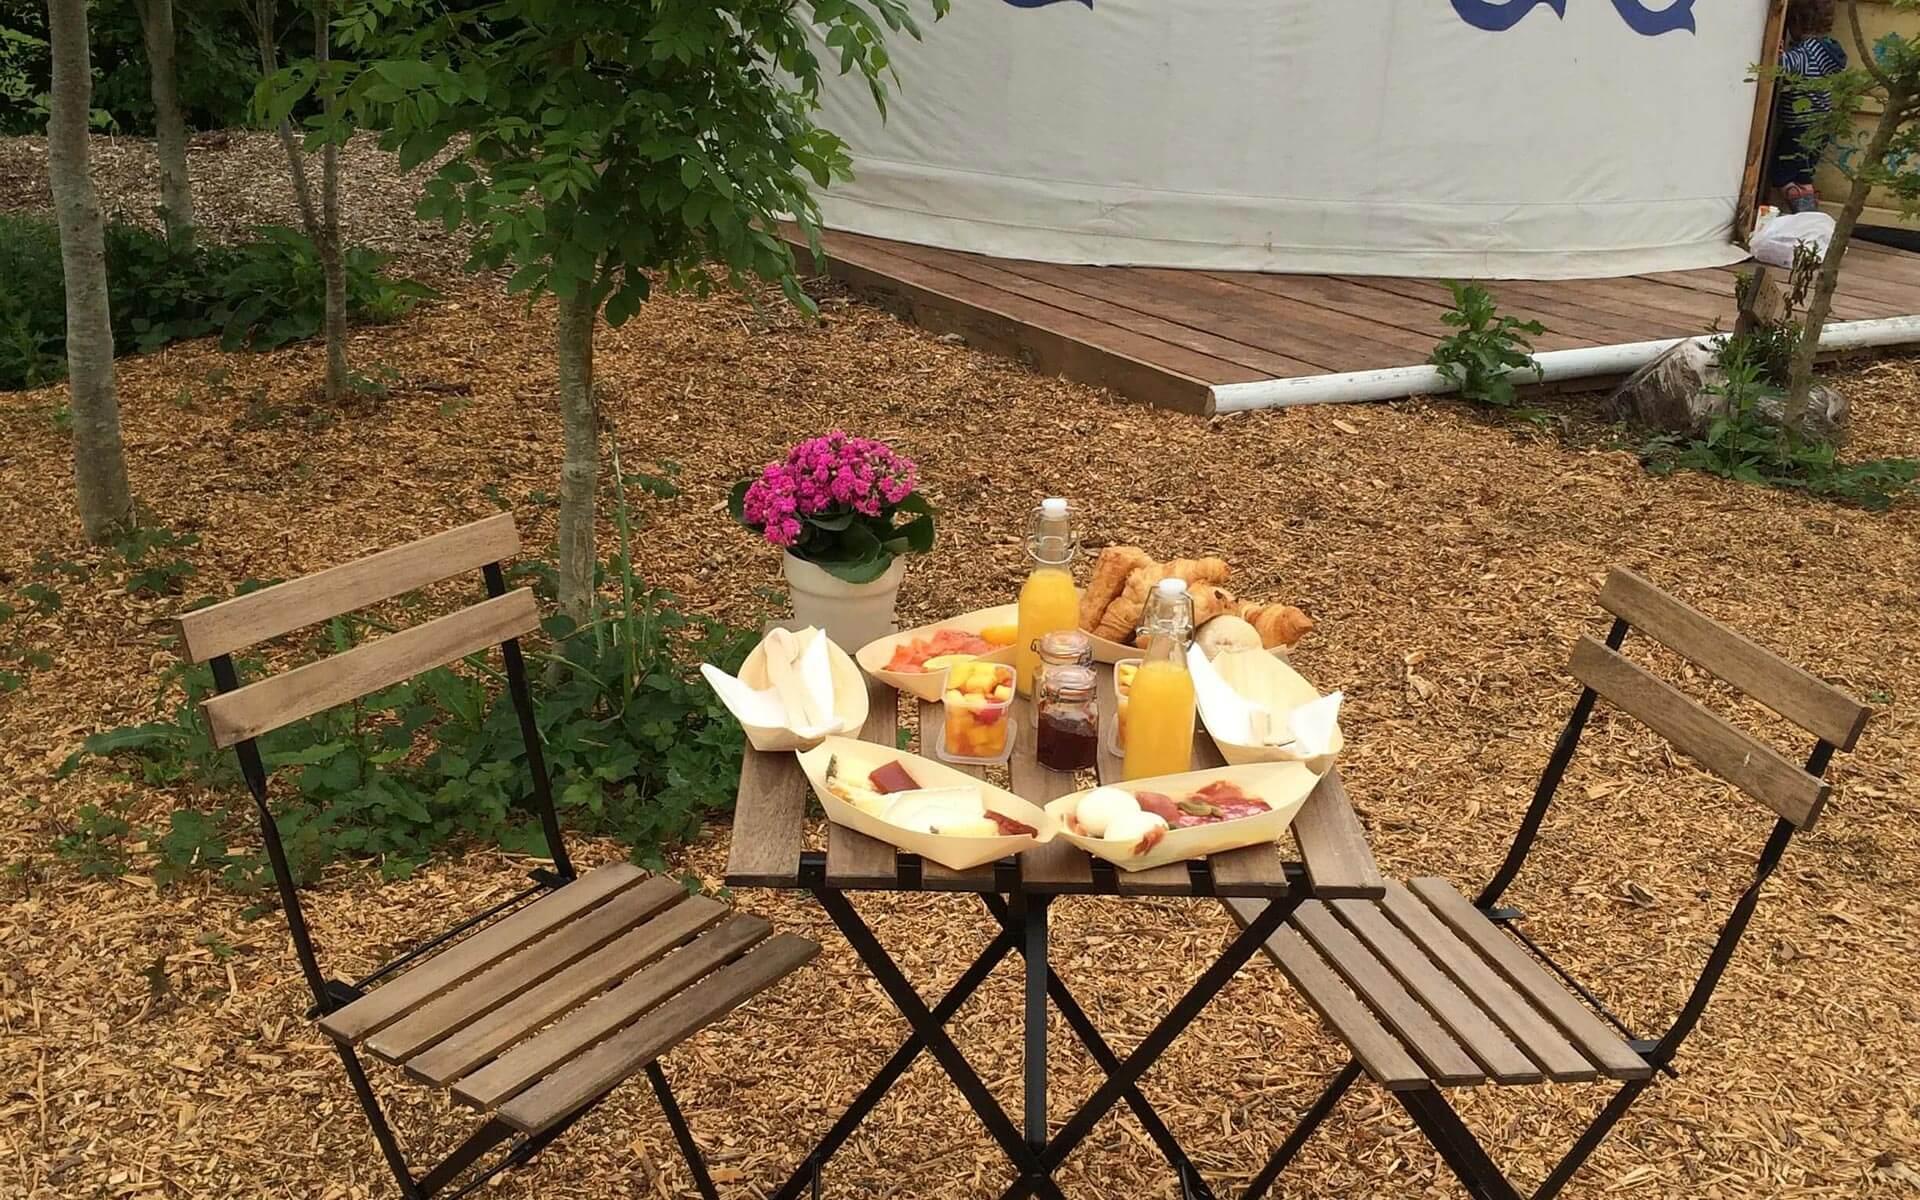 outdoor-dining-breakfast-hamper-yurt-Plush-Tents-Glamping-1200